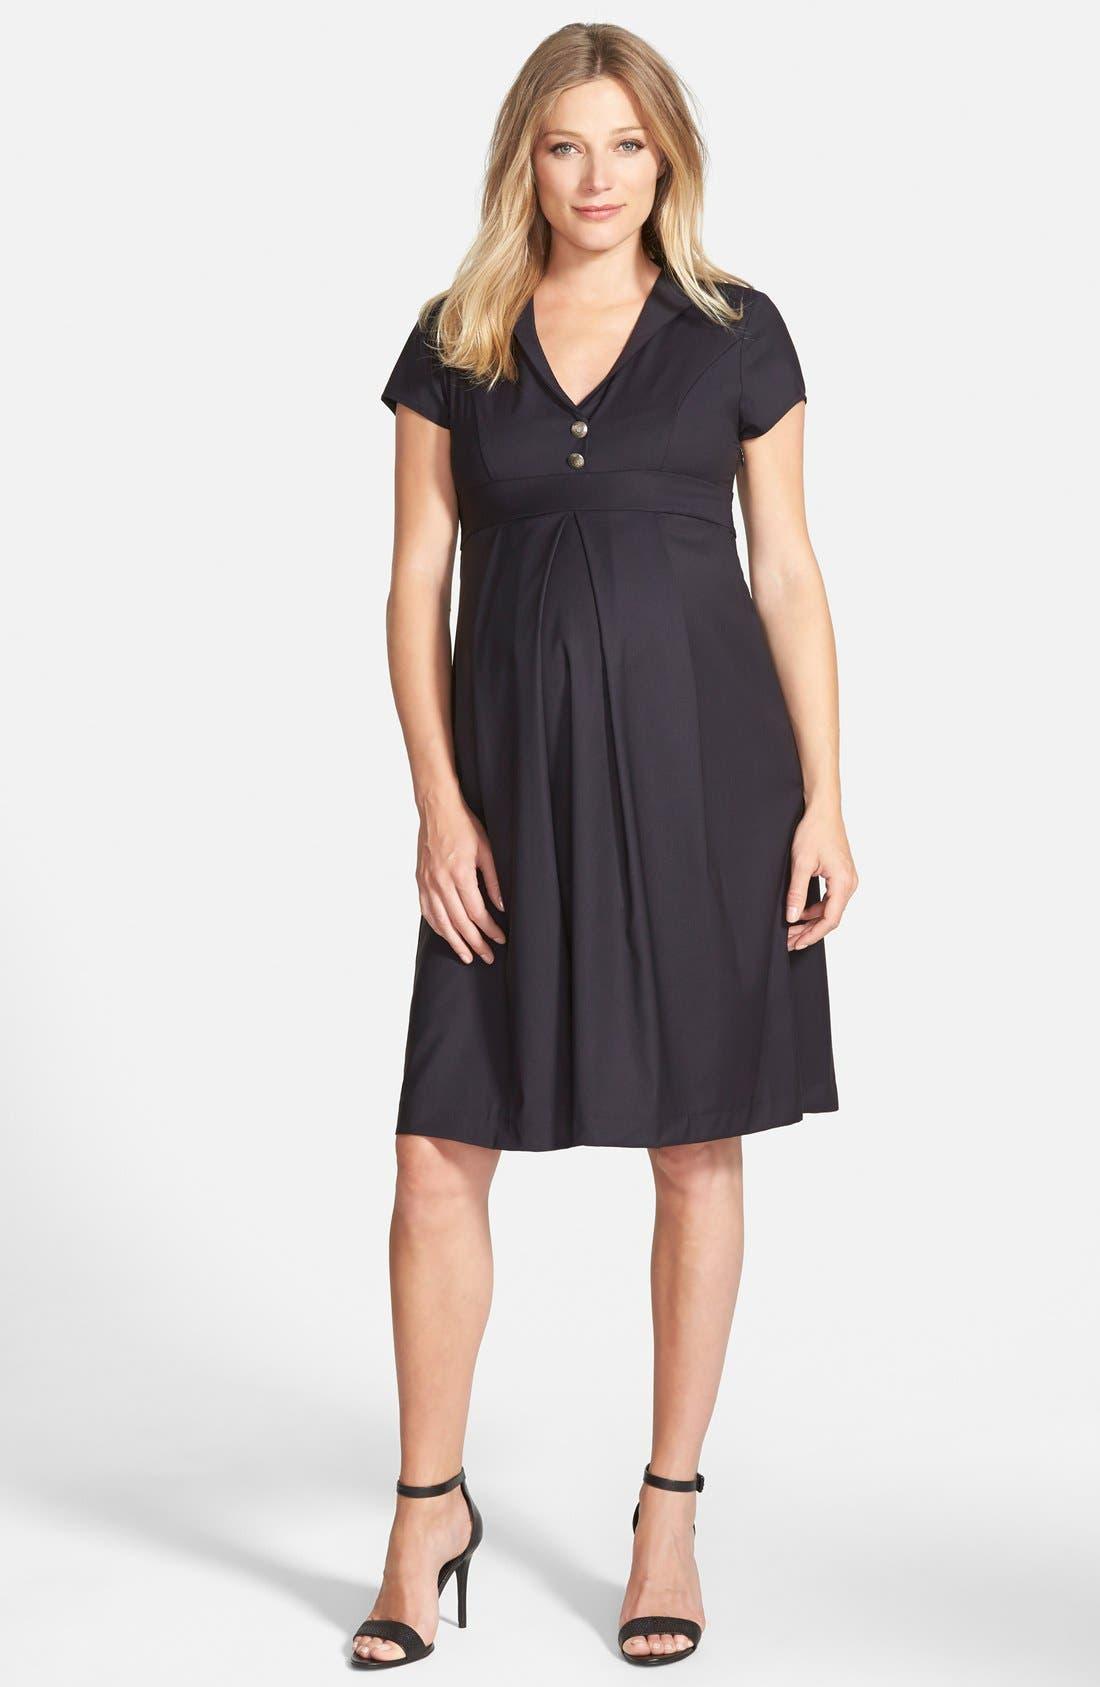 Main Image - Eva Alexander London 'Audrey' Maternity Dress